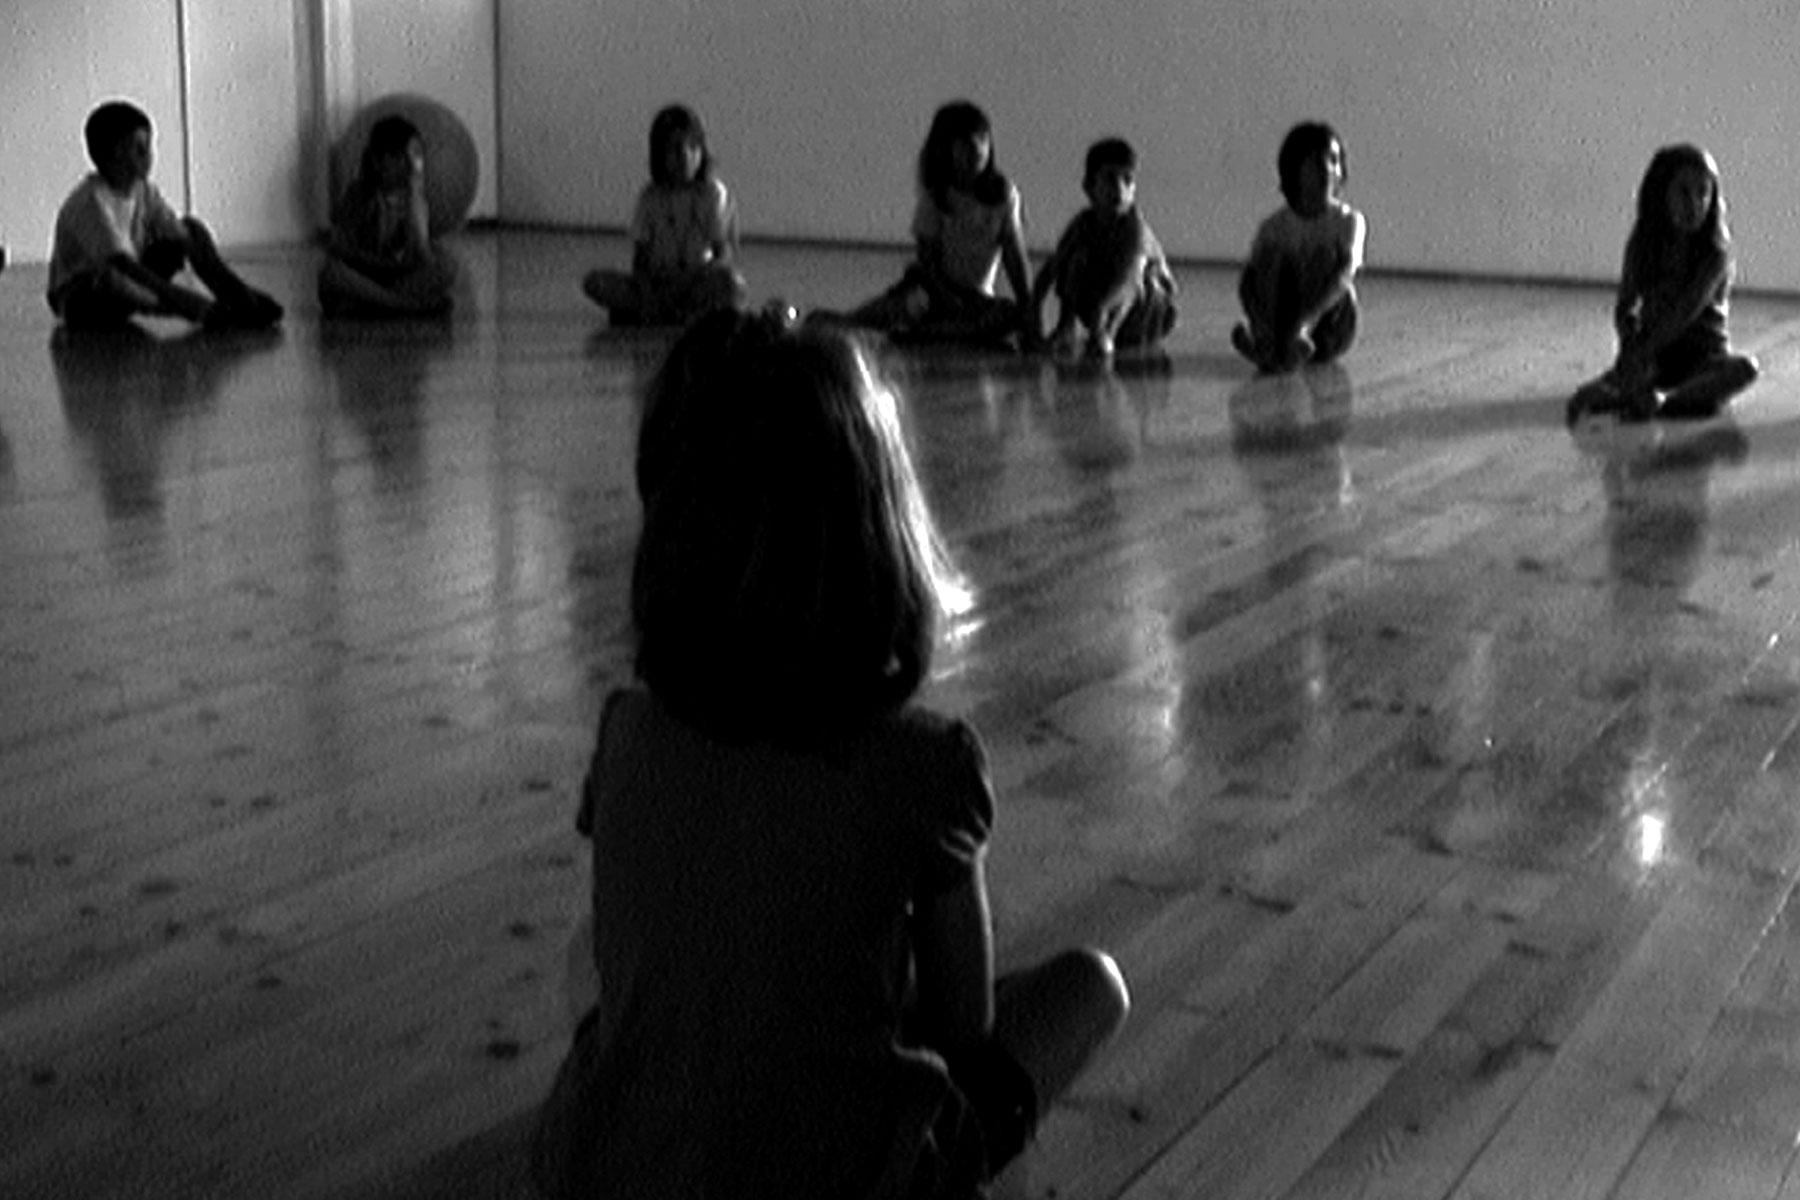 DARK ROOM - Art, Education & Child Development